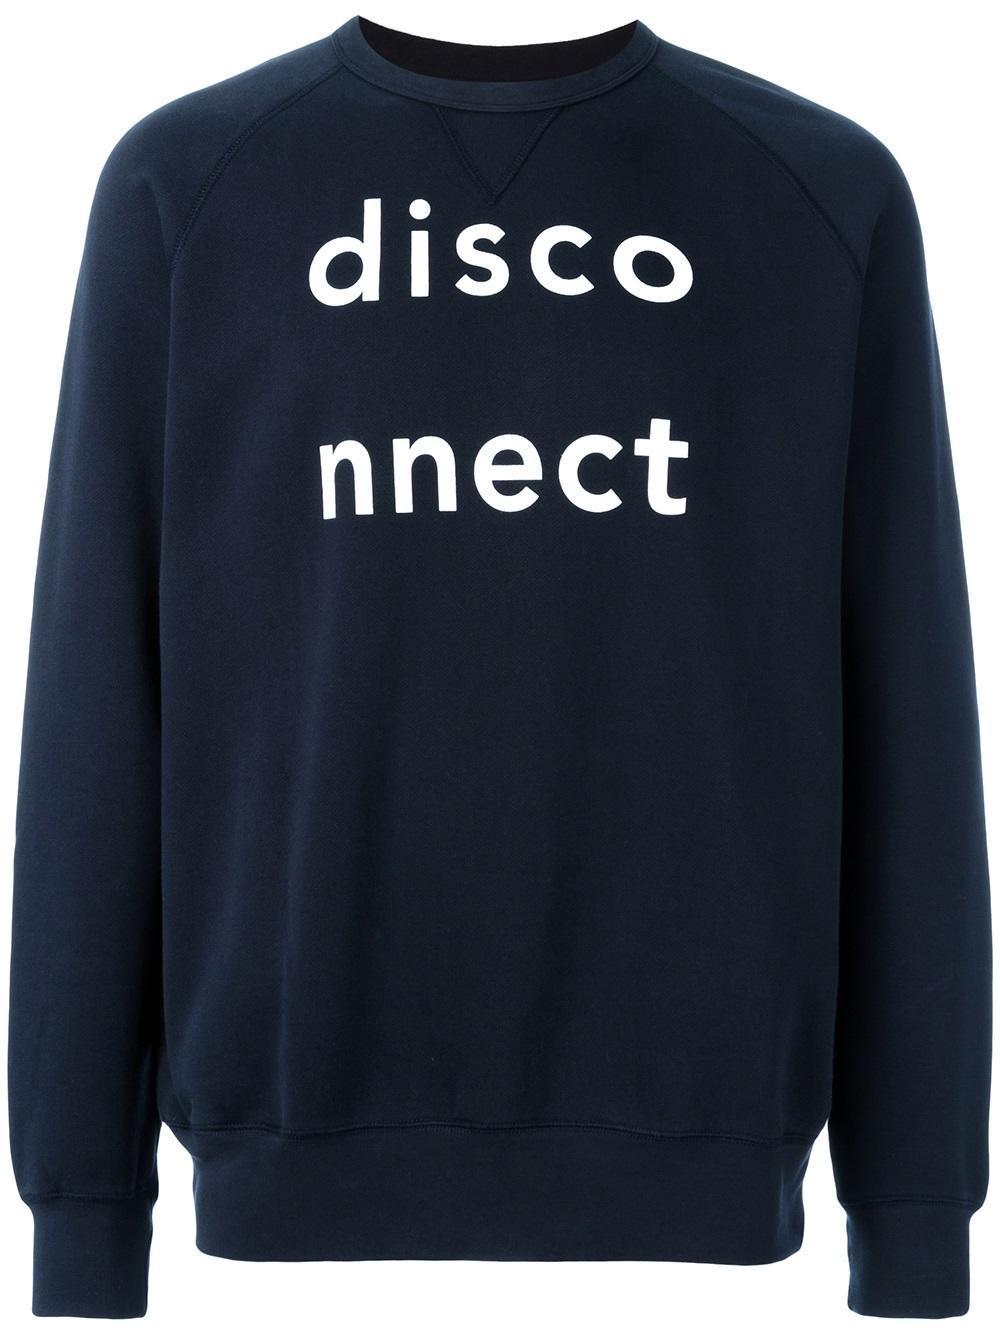 Lyst - WOOD WOOD  disconnect  Sweatshirt in Blue for Men d0124ce4d3